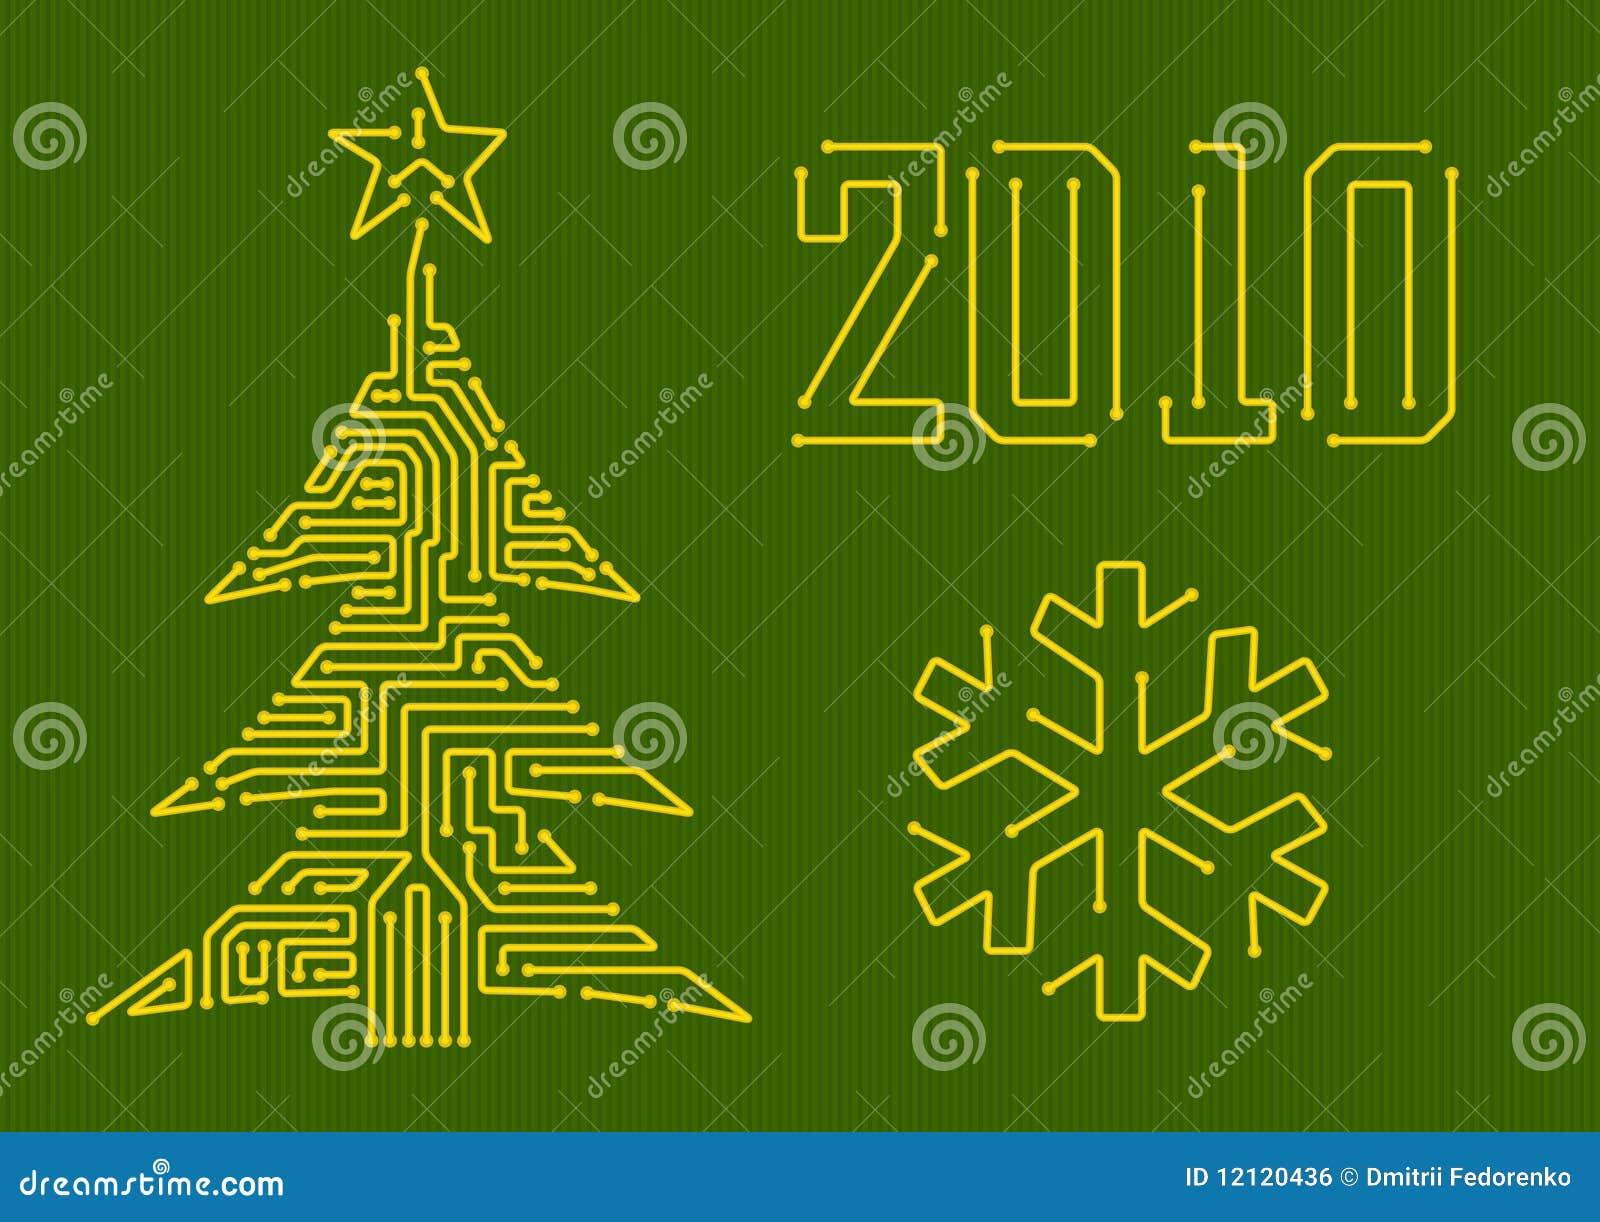 Christmas Tree Circuit Agcrewall Hj94015 Music Lights Control Controlcircuit Royalty Free Stock Image